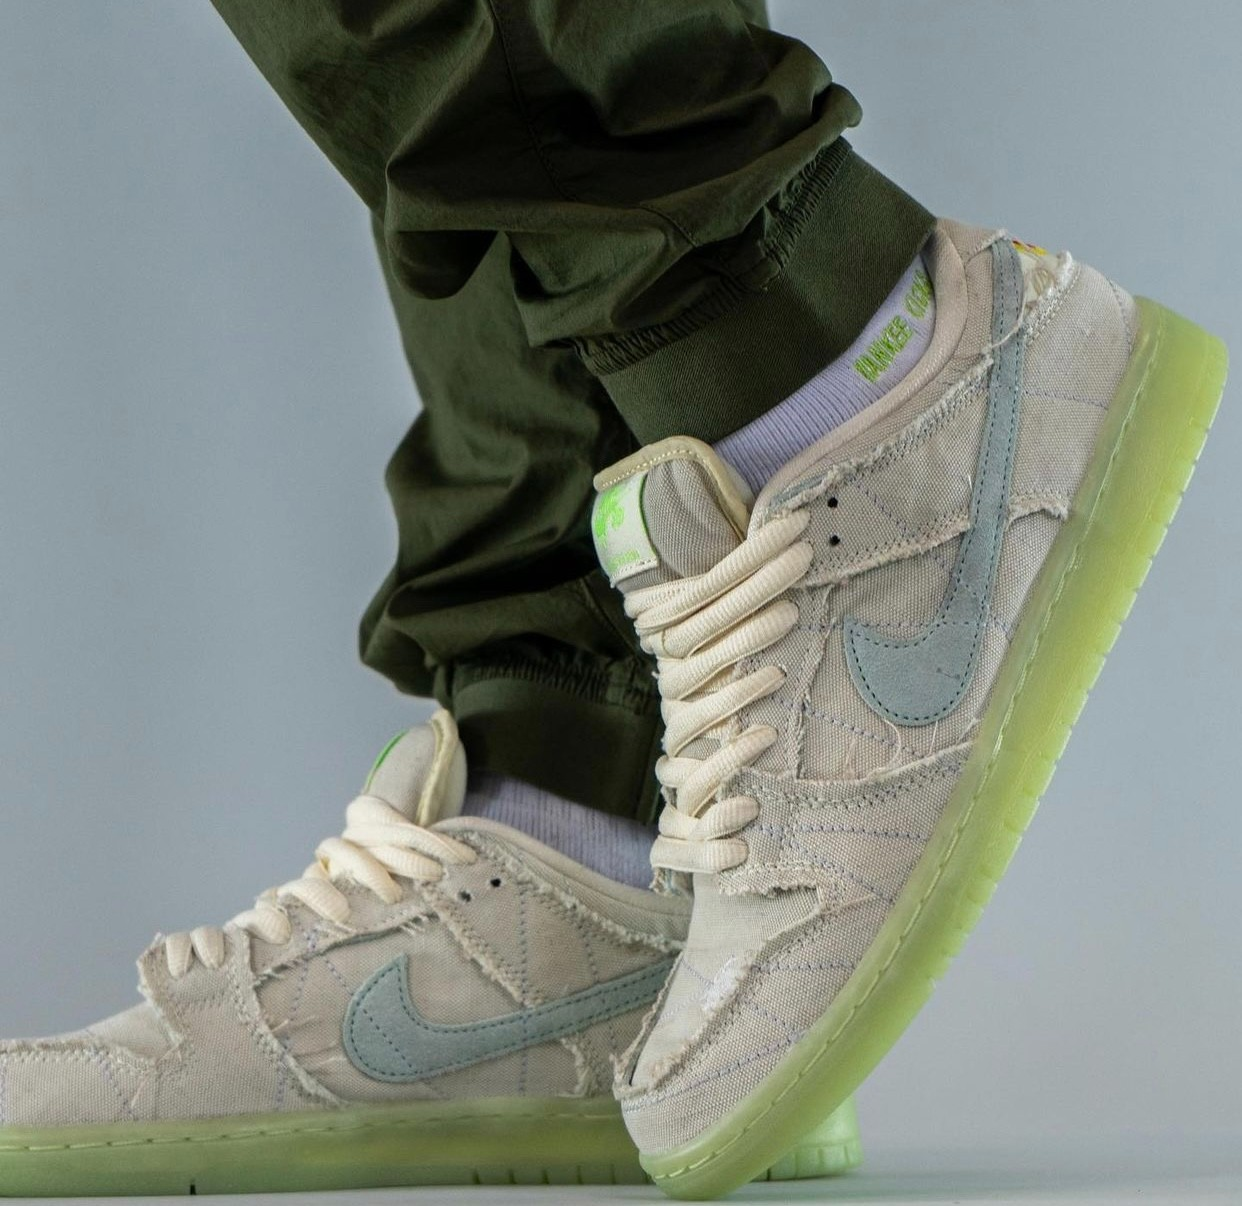 Nike,SB Dunk Low,Mummy  可玩性极高!全新「木乃伊」SB Dunk 上脚图曝光!